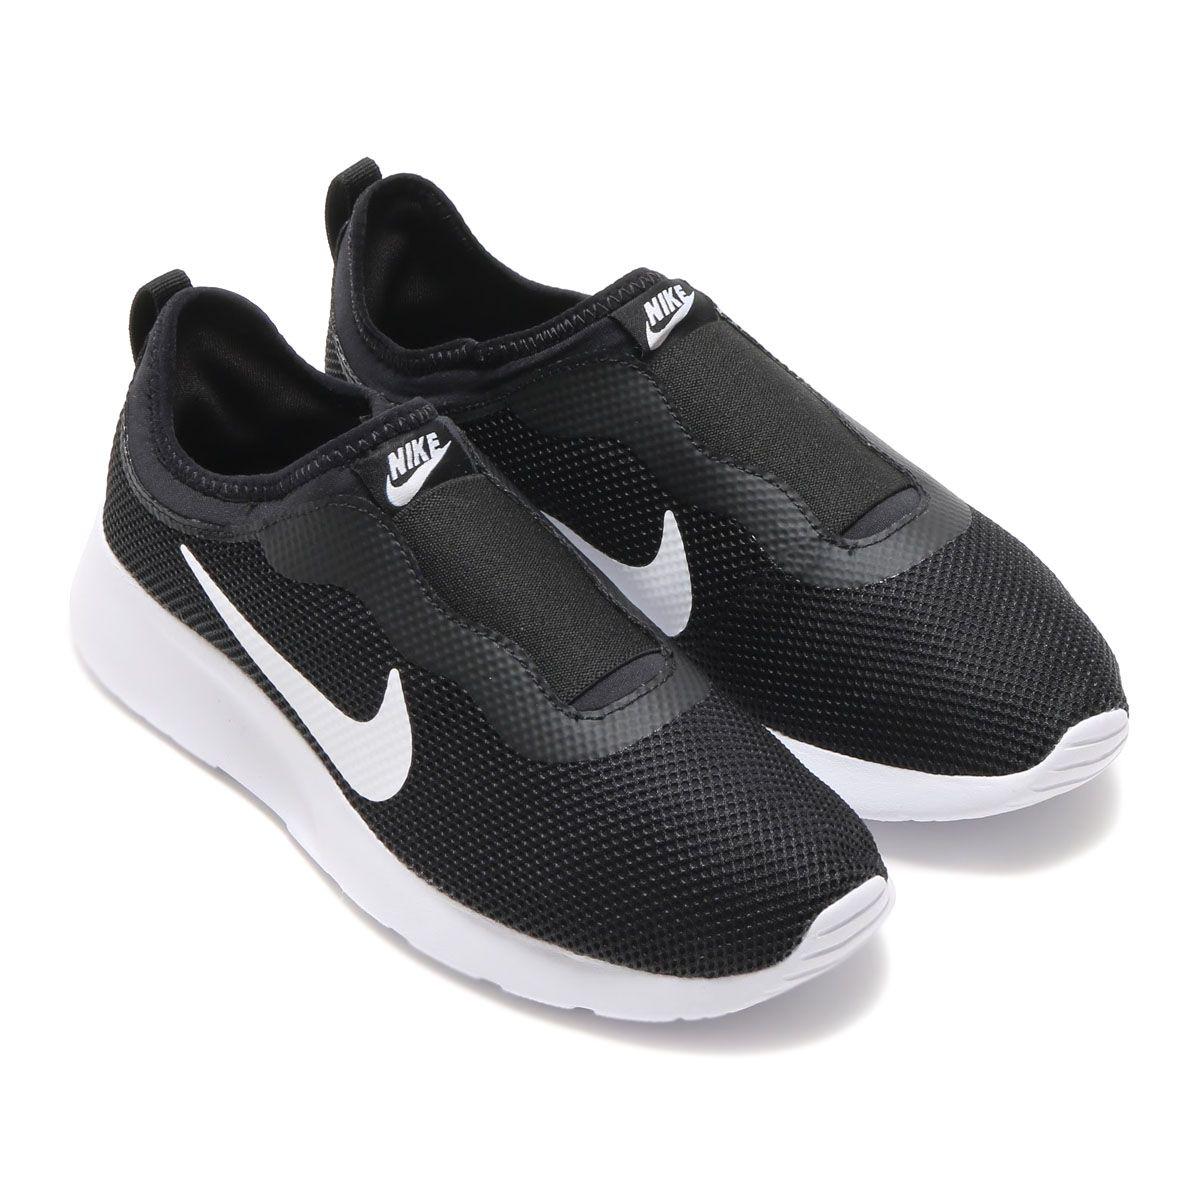 NIKEWMNSTANJUNSLIP (Nike Women's Tanjung Slip) BLACK / WHITE [Men's Women's  Sneakers] 17SU-I | Nike | Pinterest | Footwear